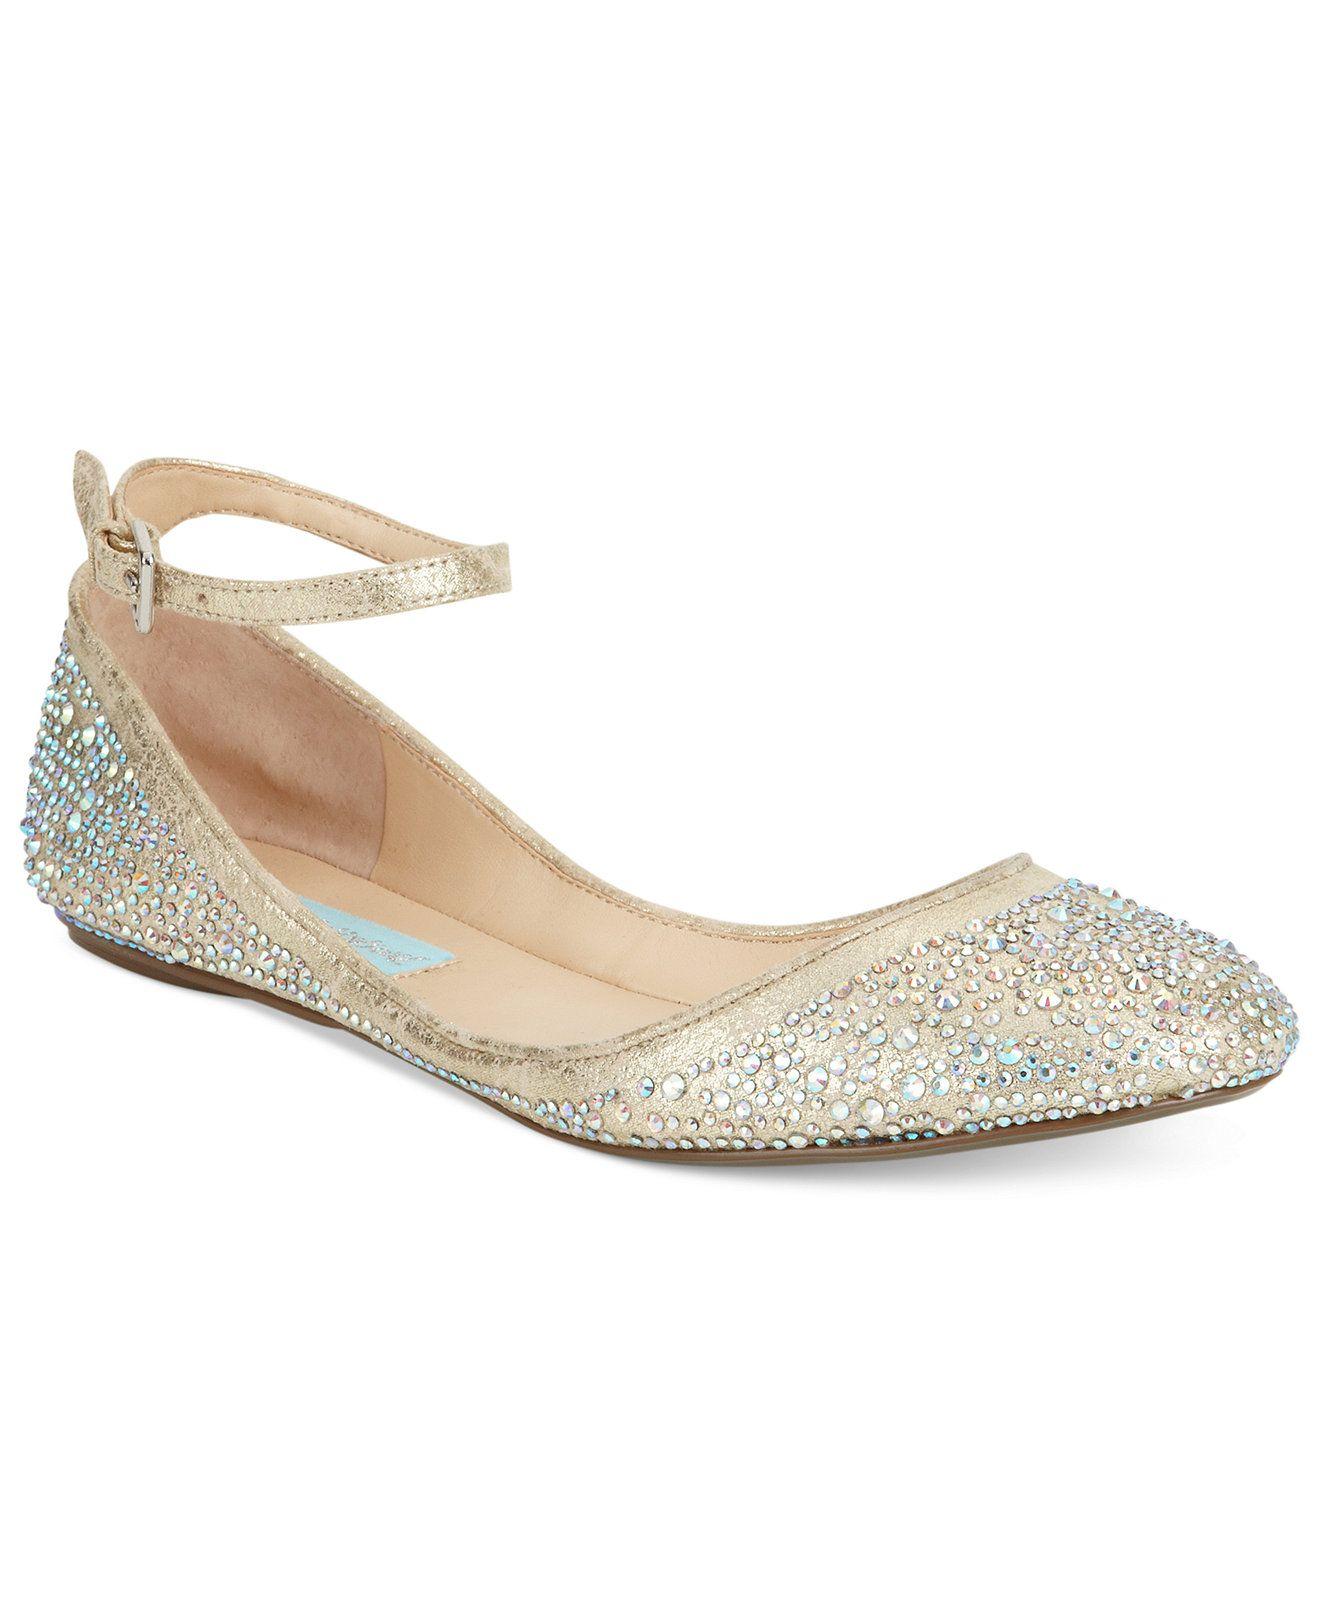 Blue By Betsey Johnson Joy Evening Flats Evening Bridal Shoes Macy S Betsey Johnson Shoes Evening Flats Homecoming Shoes